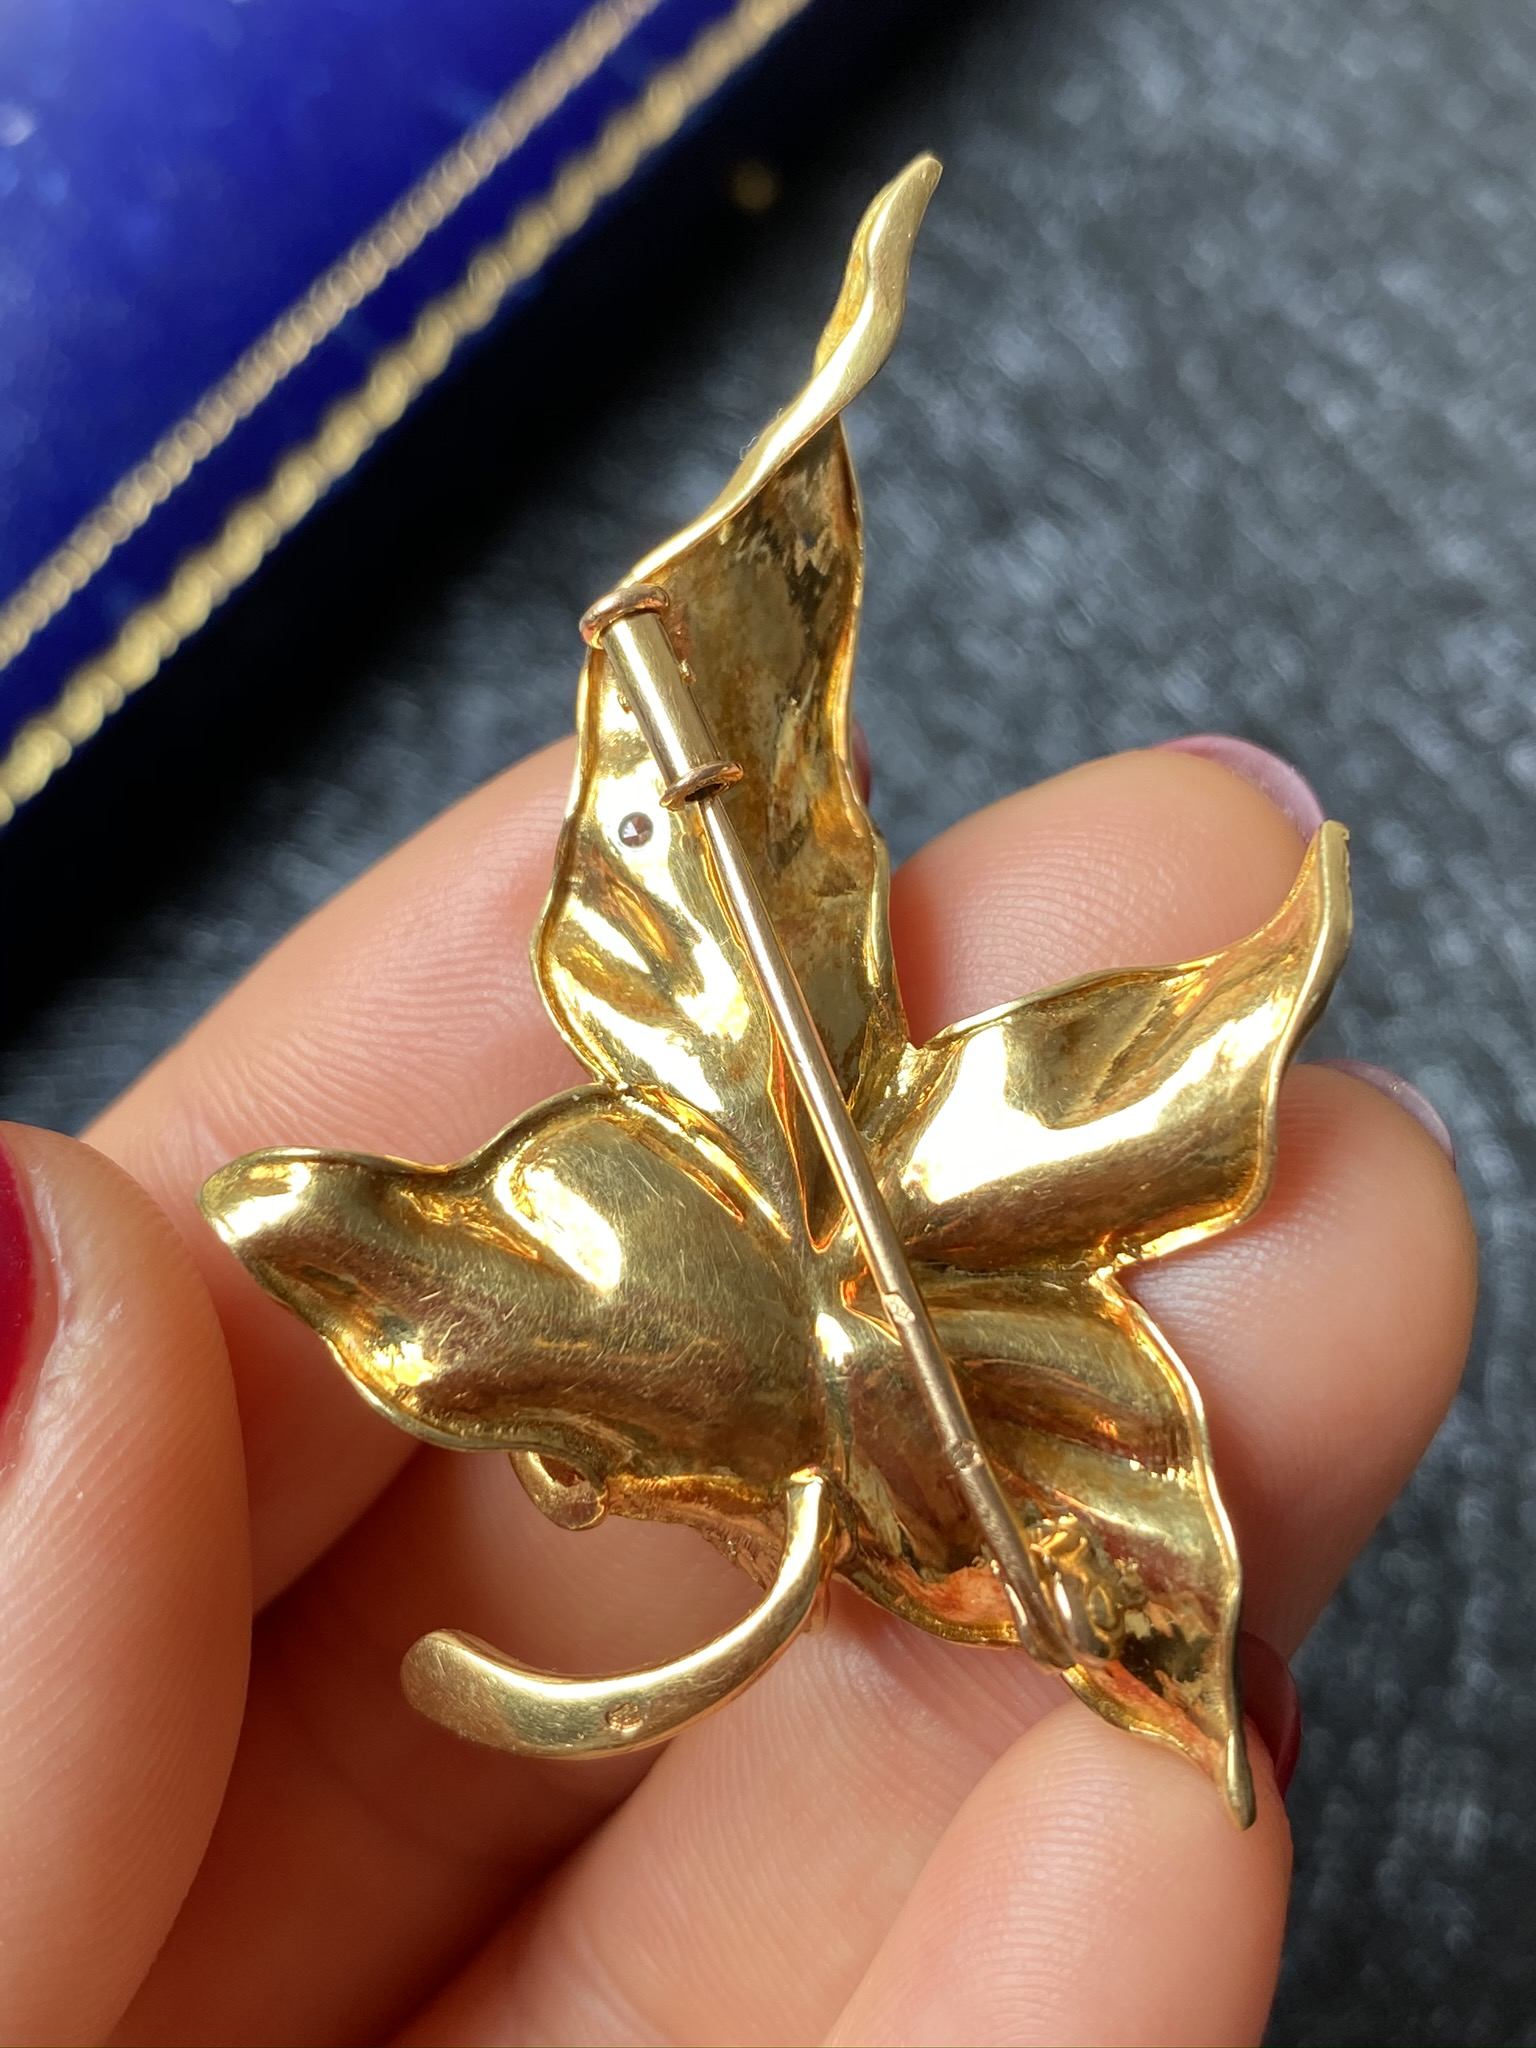 Lot 12 - 18K Gold and Diamond Brooch